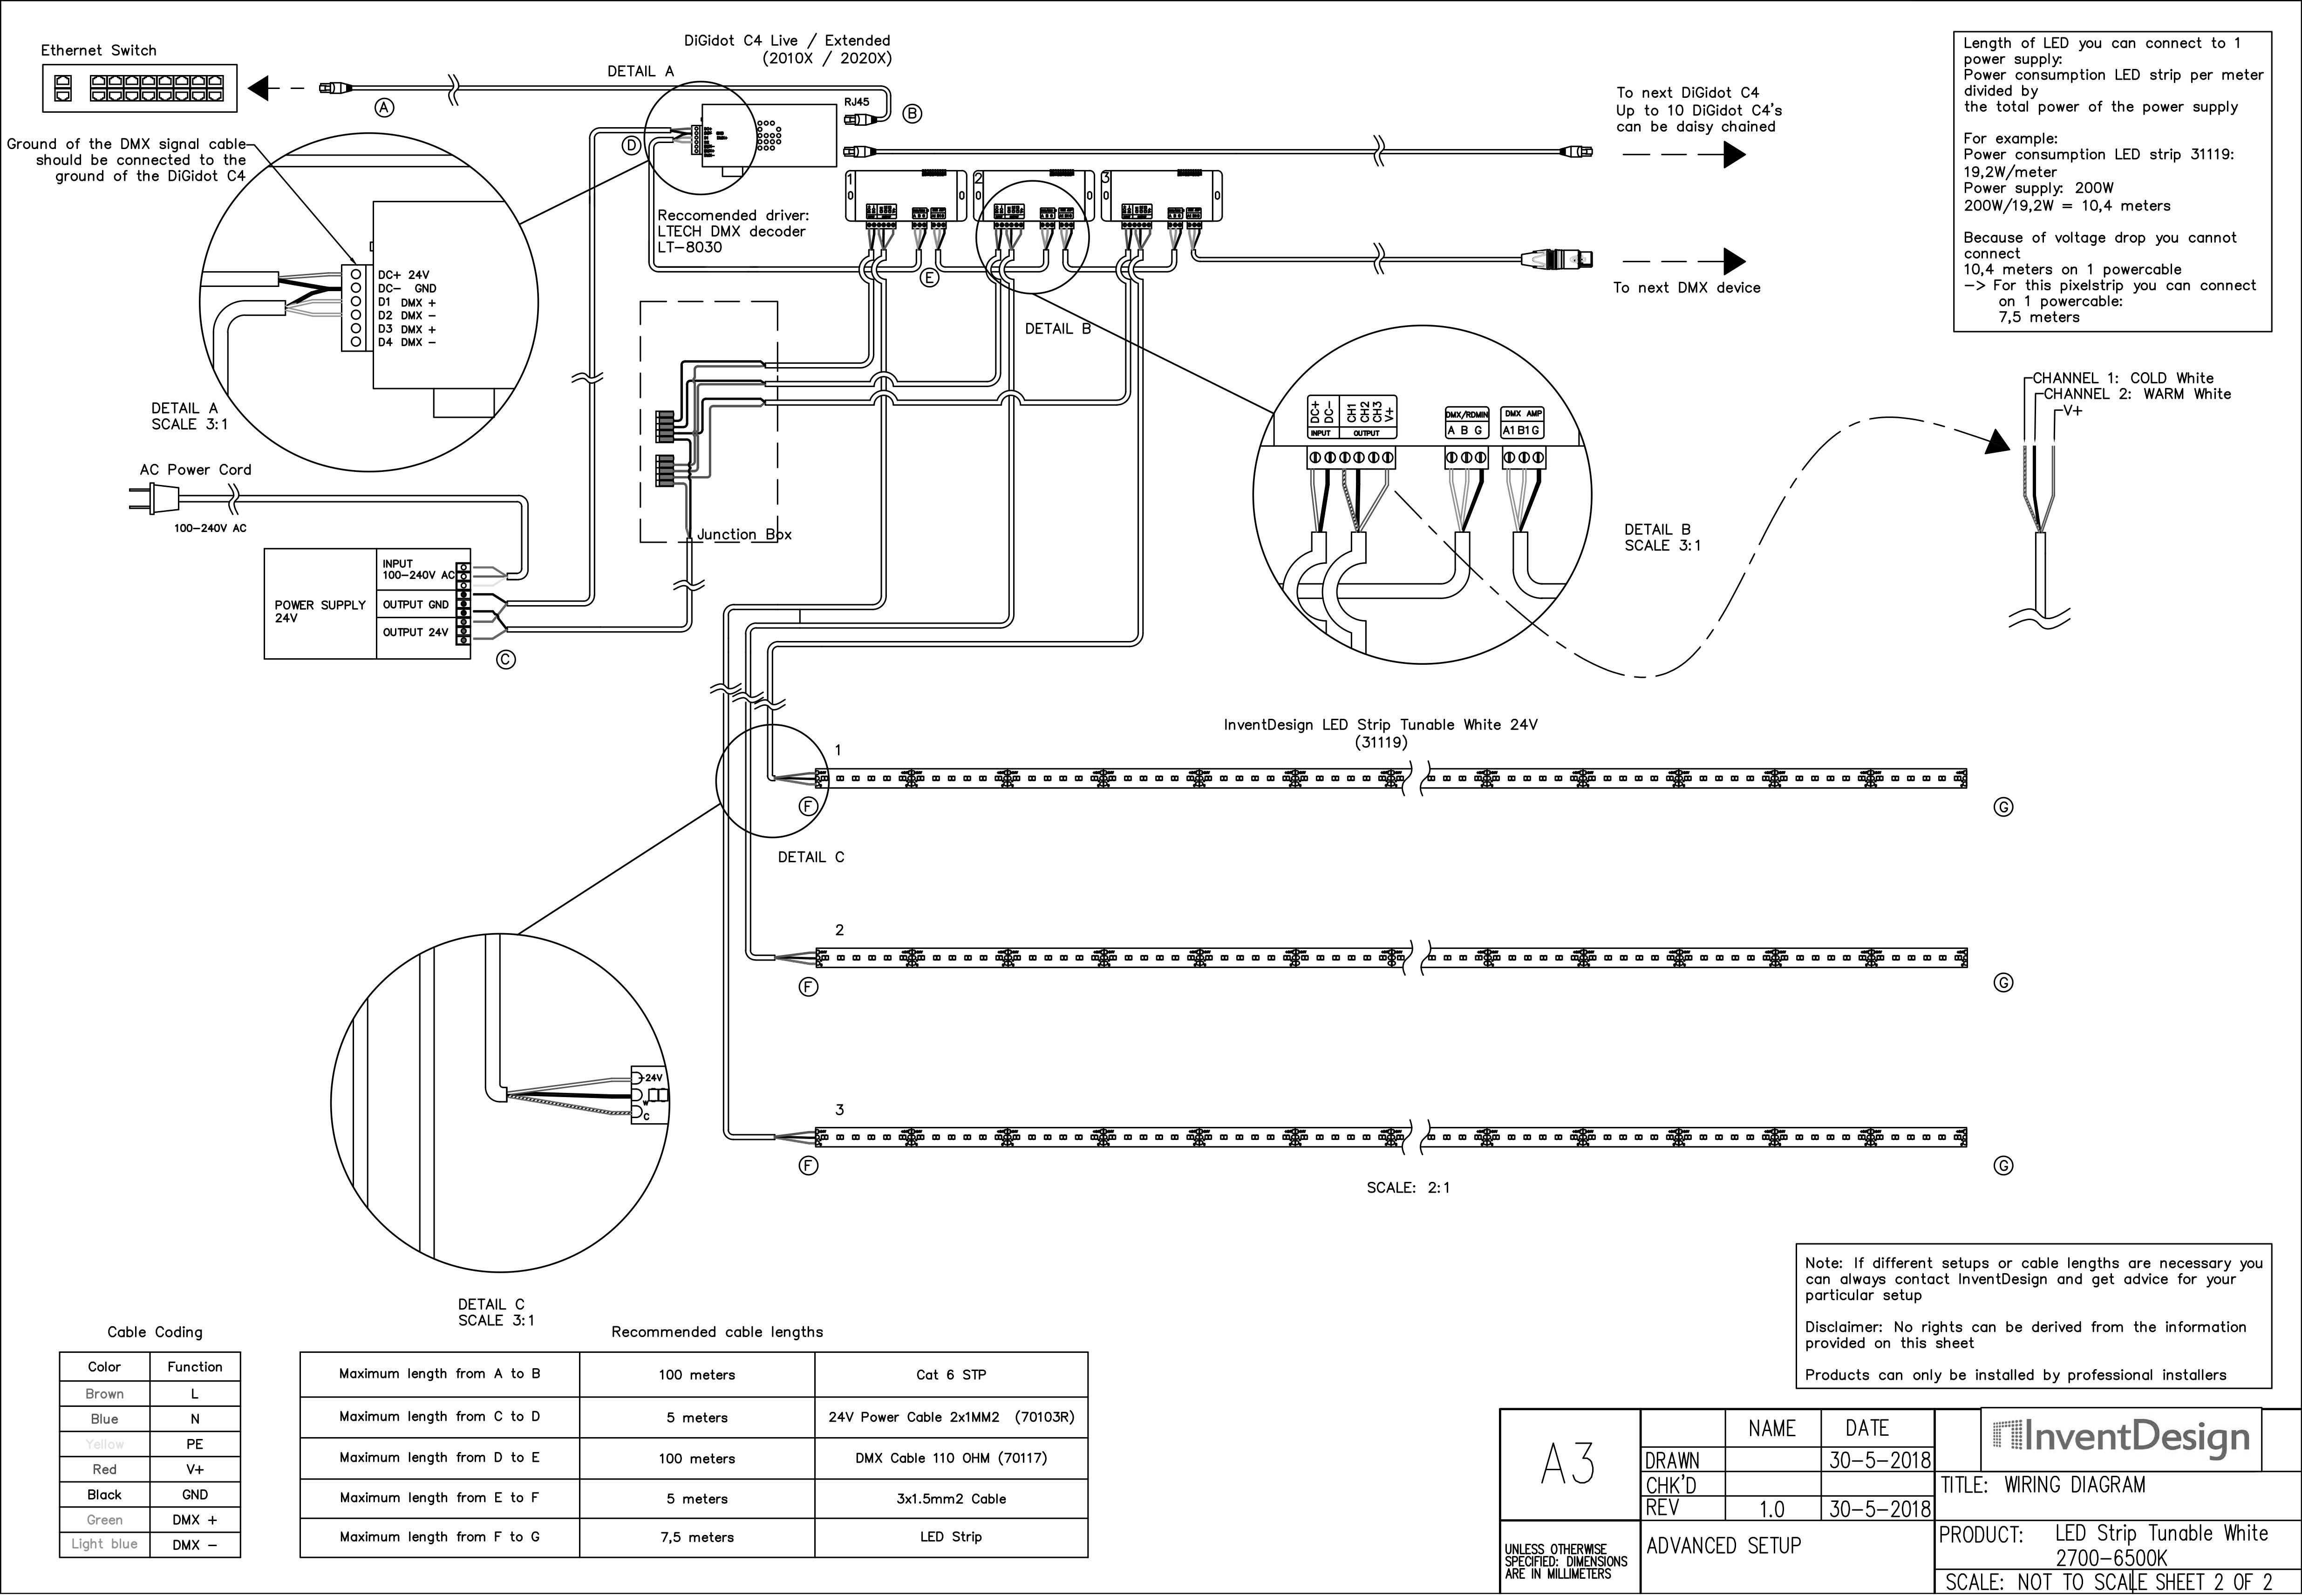 Led Strip Wiring Diagram Advanced Reference 31119 Ad White 24v